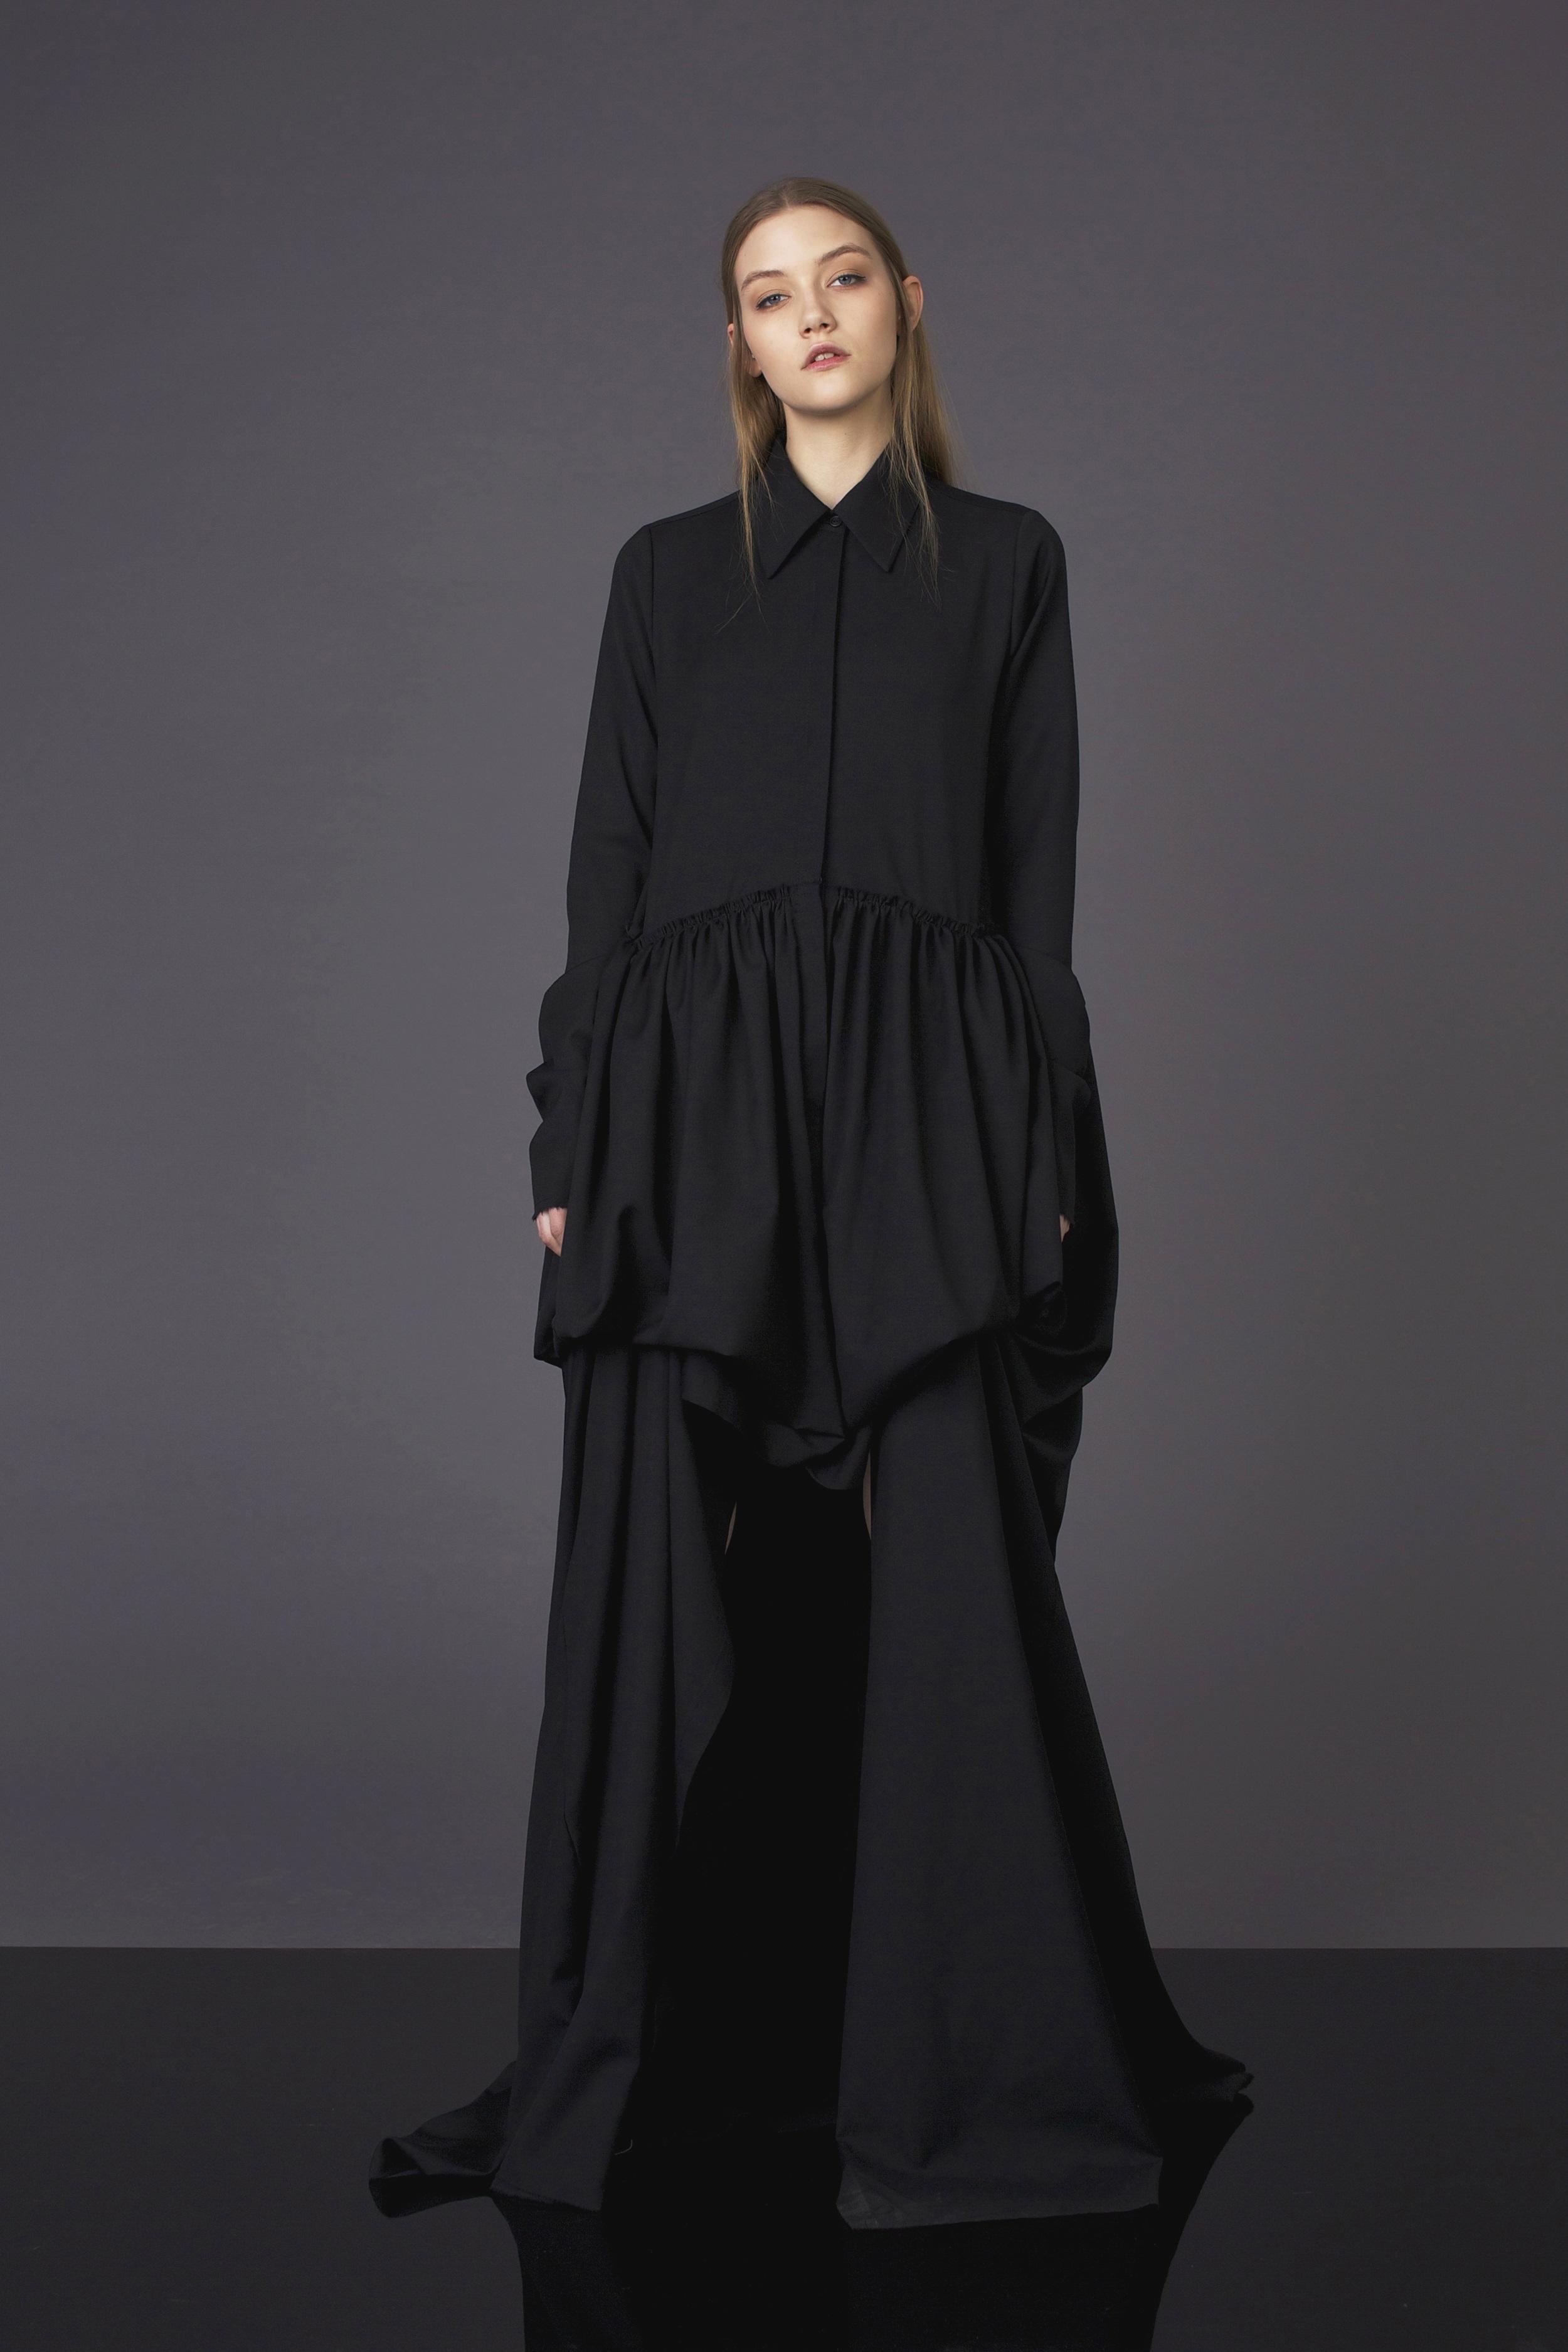 long evening dress - Diana Paukstyte